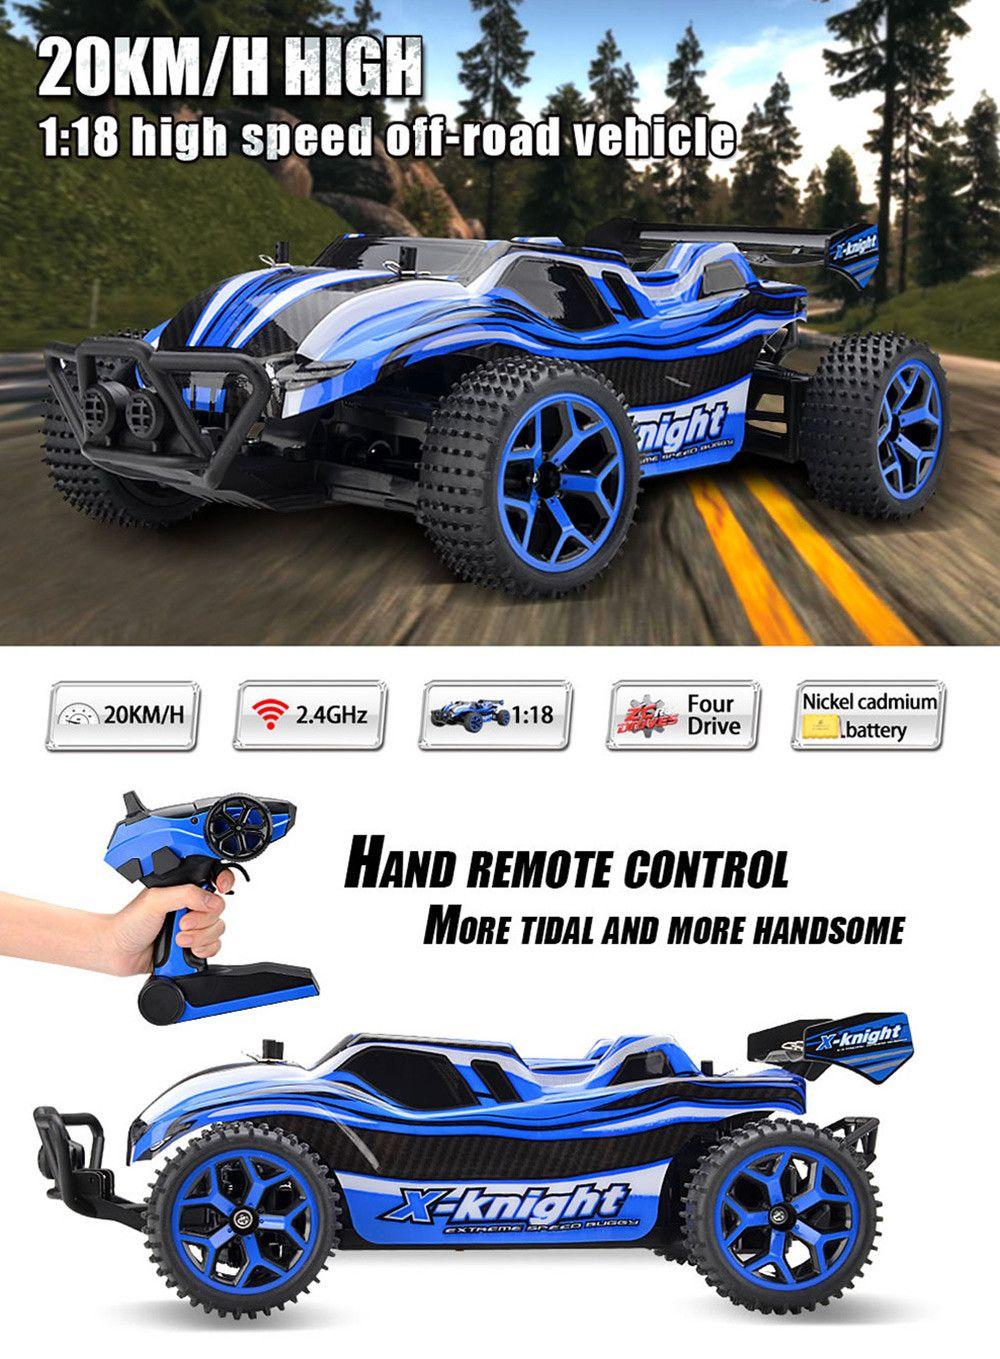 ZC X - Knight 333 - GS05B 1 / 18 Full Scale 4WD 2.4G 4 Channel High Speed Crossing Car RTR